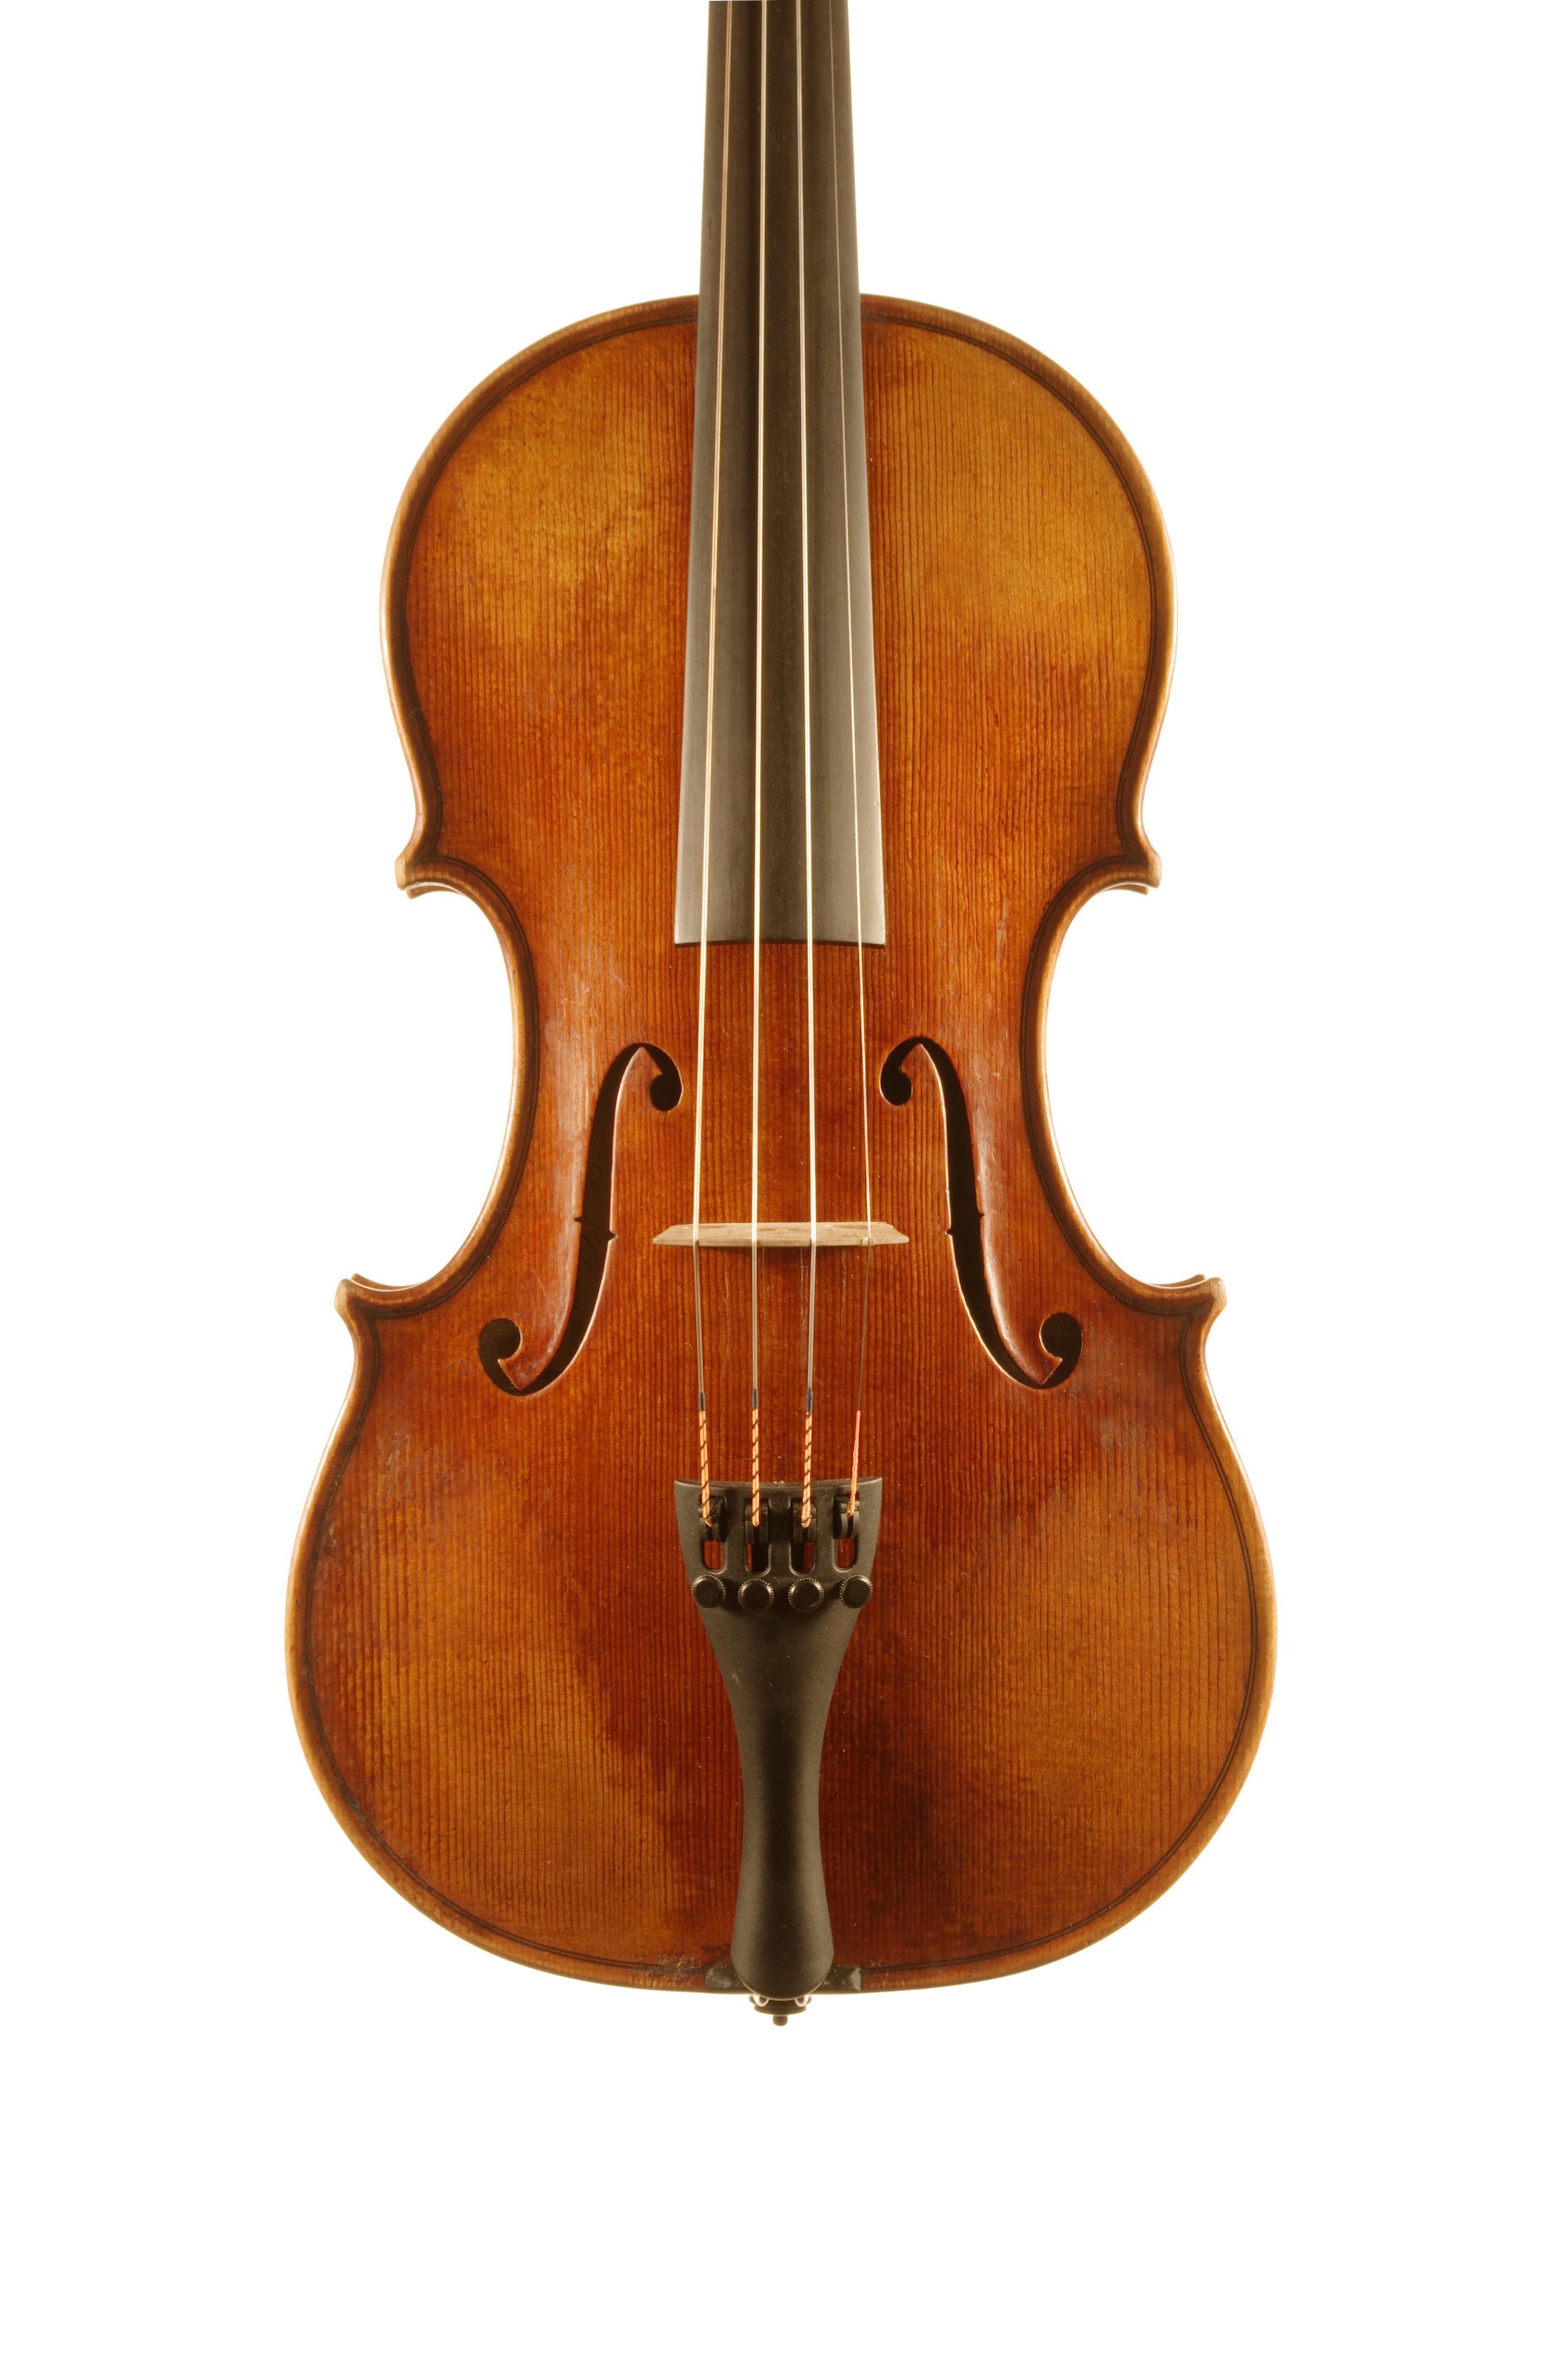 Violon - Luthier Benjamin Beugnies